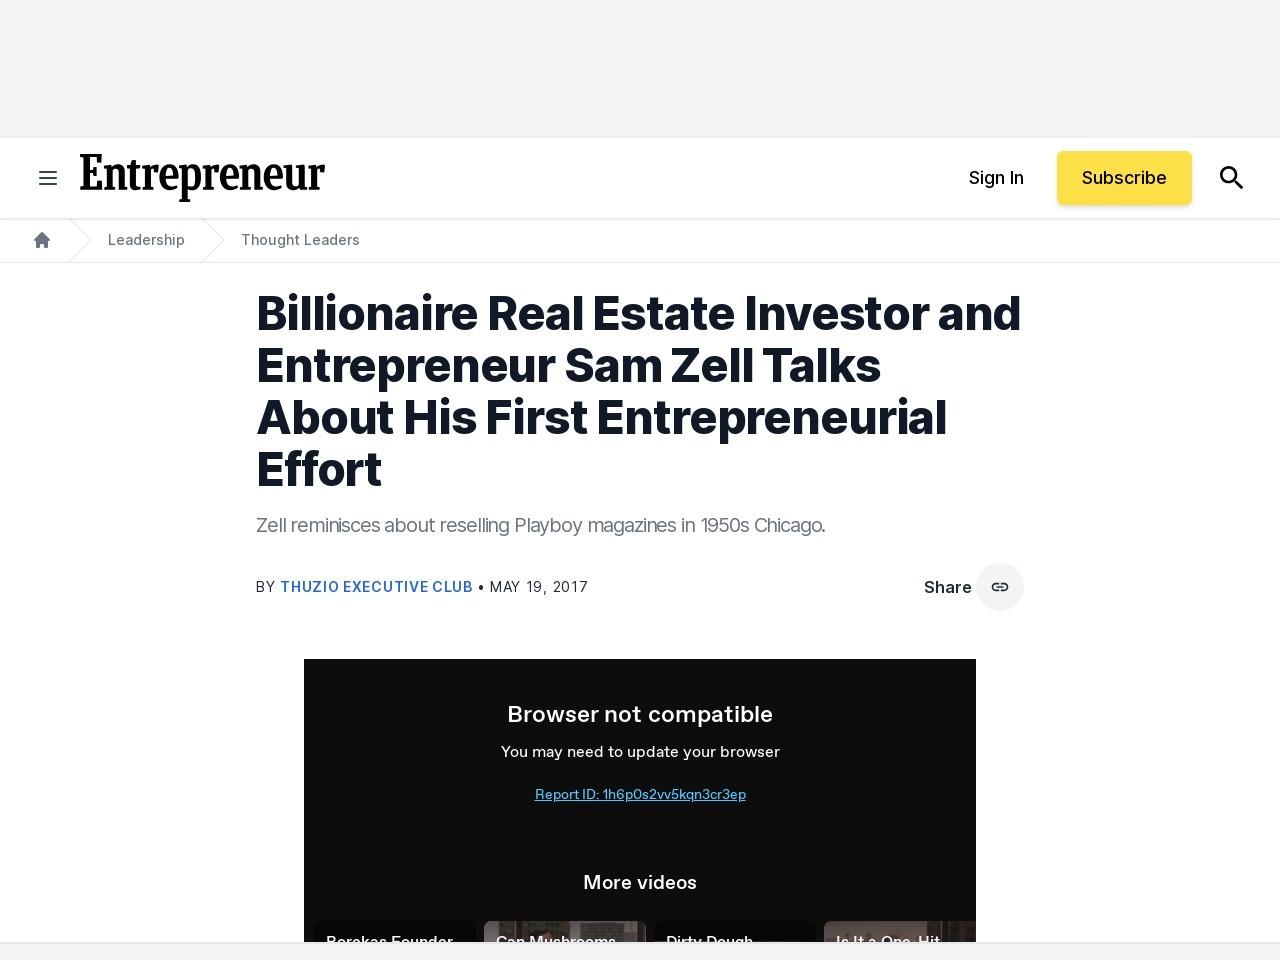 Billionaire Real Estate Investor and Entrepreneur Sam Zell Talks About His First Entrepreneurial Effort